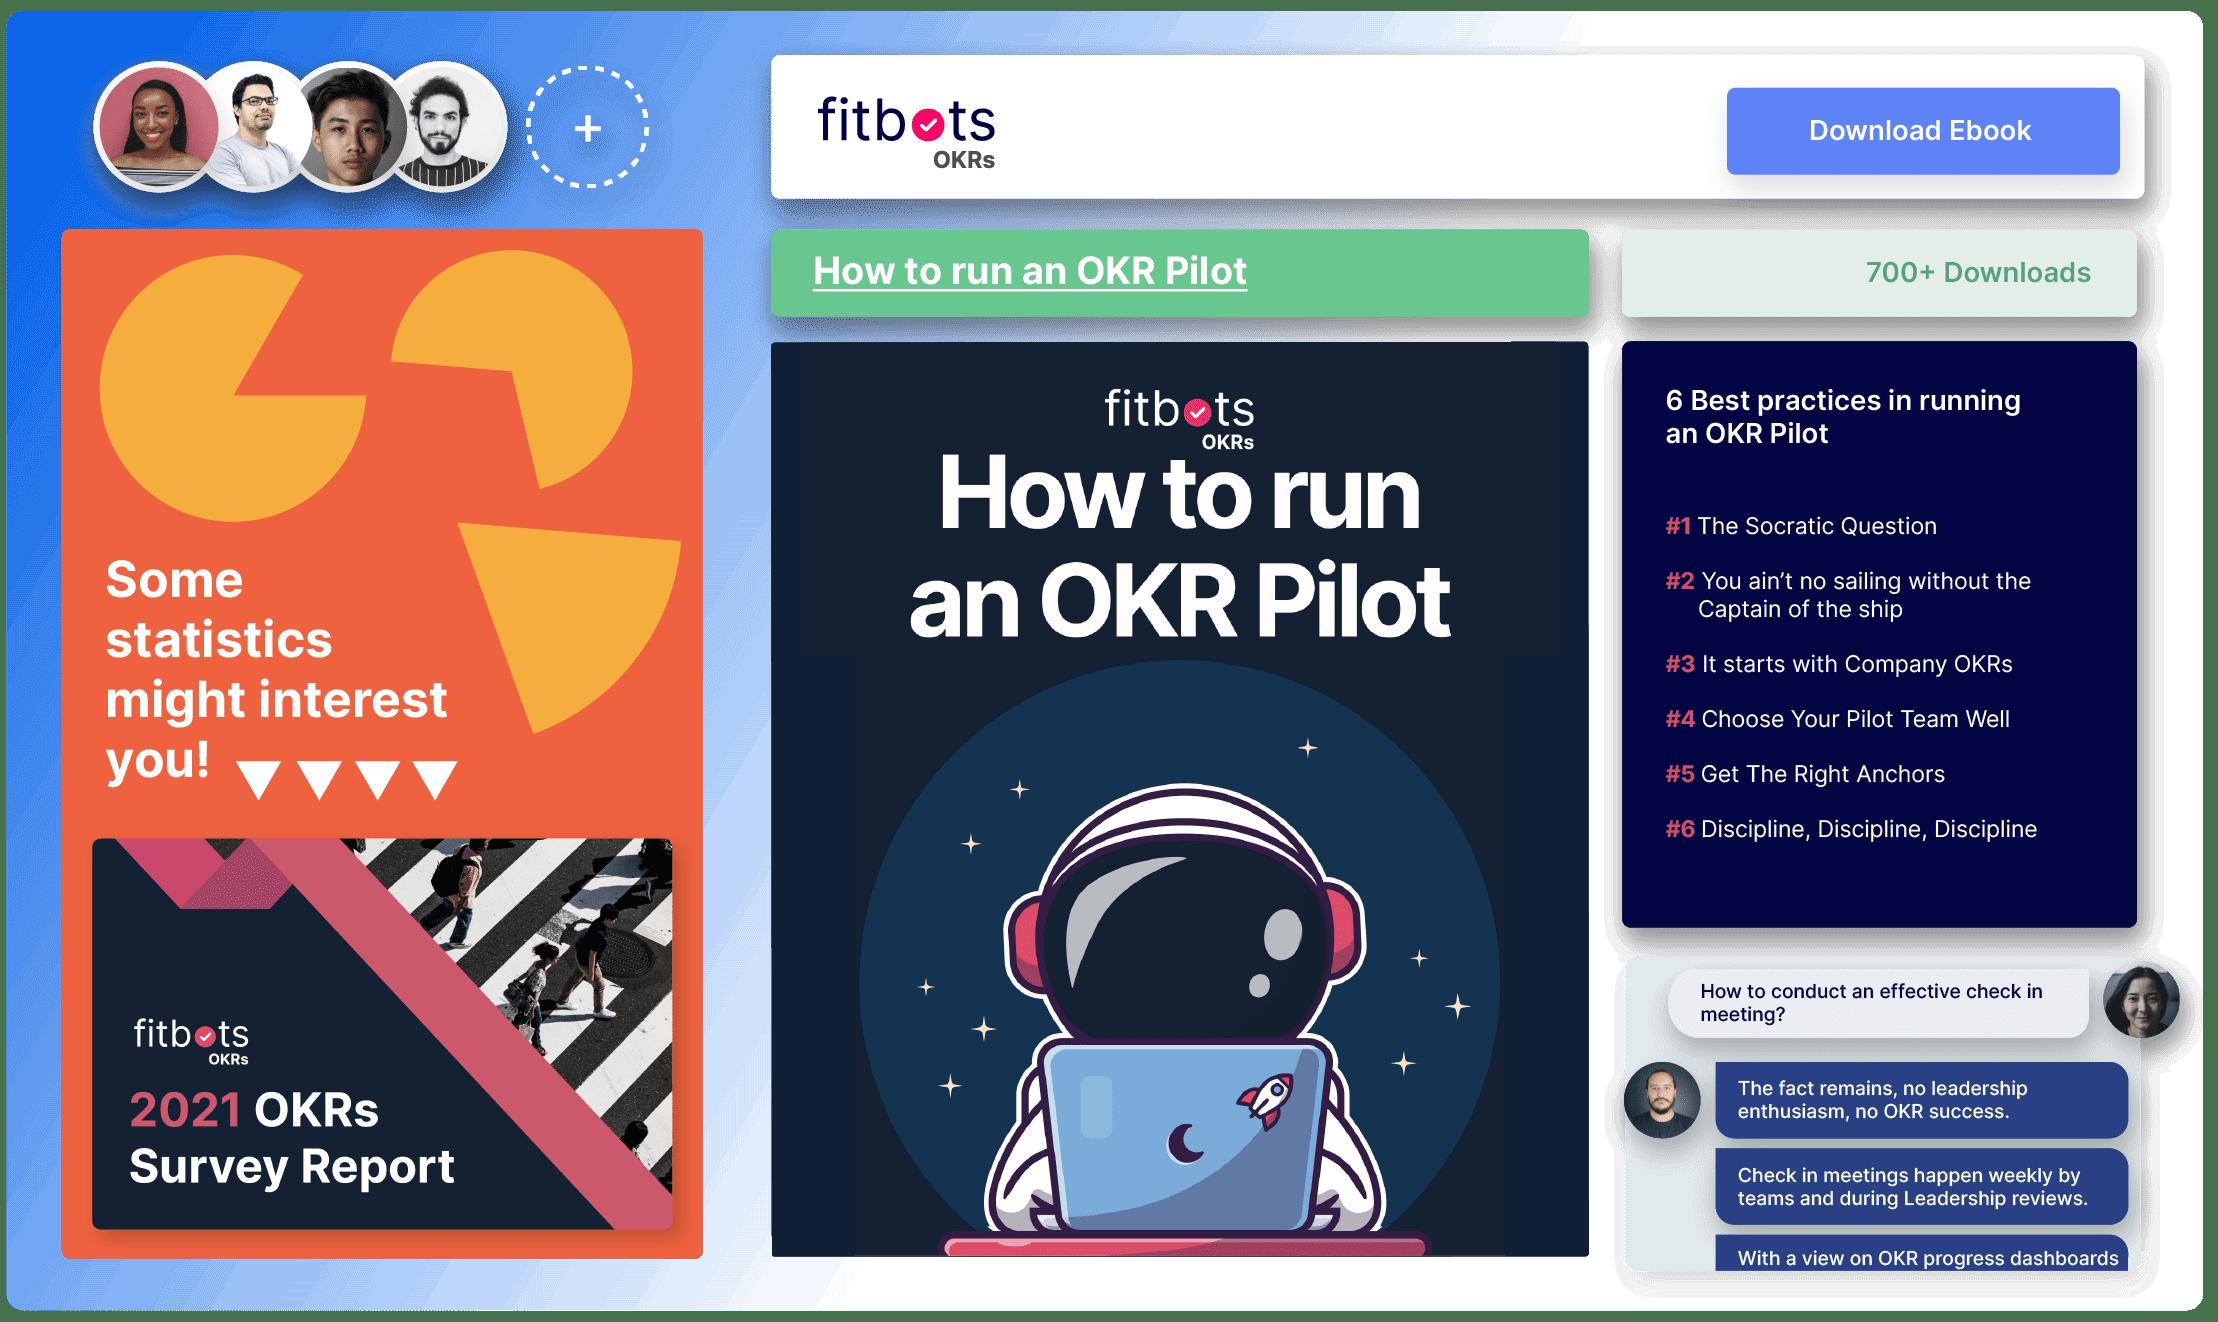 Fitbots OKRs Ebooks, OKR Experts, OKR Software, OKR Coaching, OKRs Training